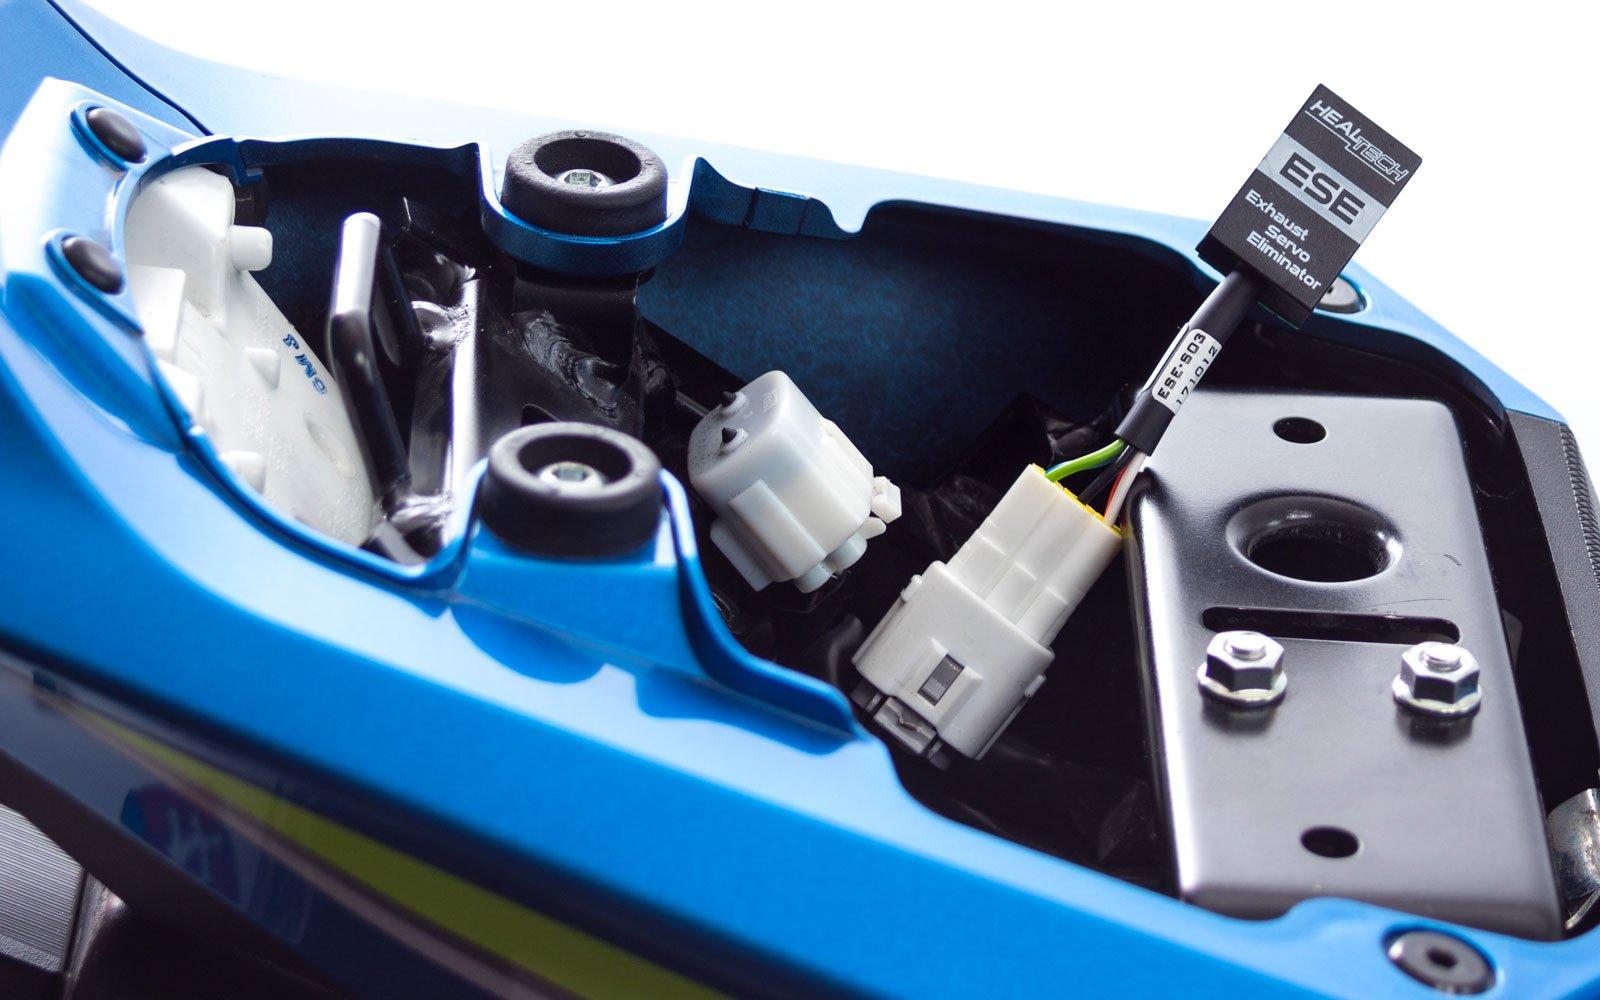 Exhaust Servo Eliminator Ese By Healtech Electronics Ltd Wiring Diagram Bmw S1000rr Ducati Multistrada 1200